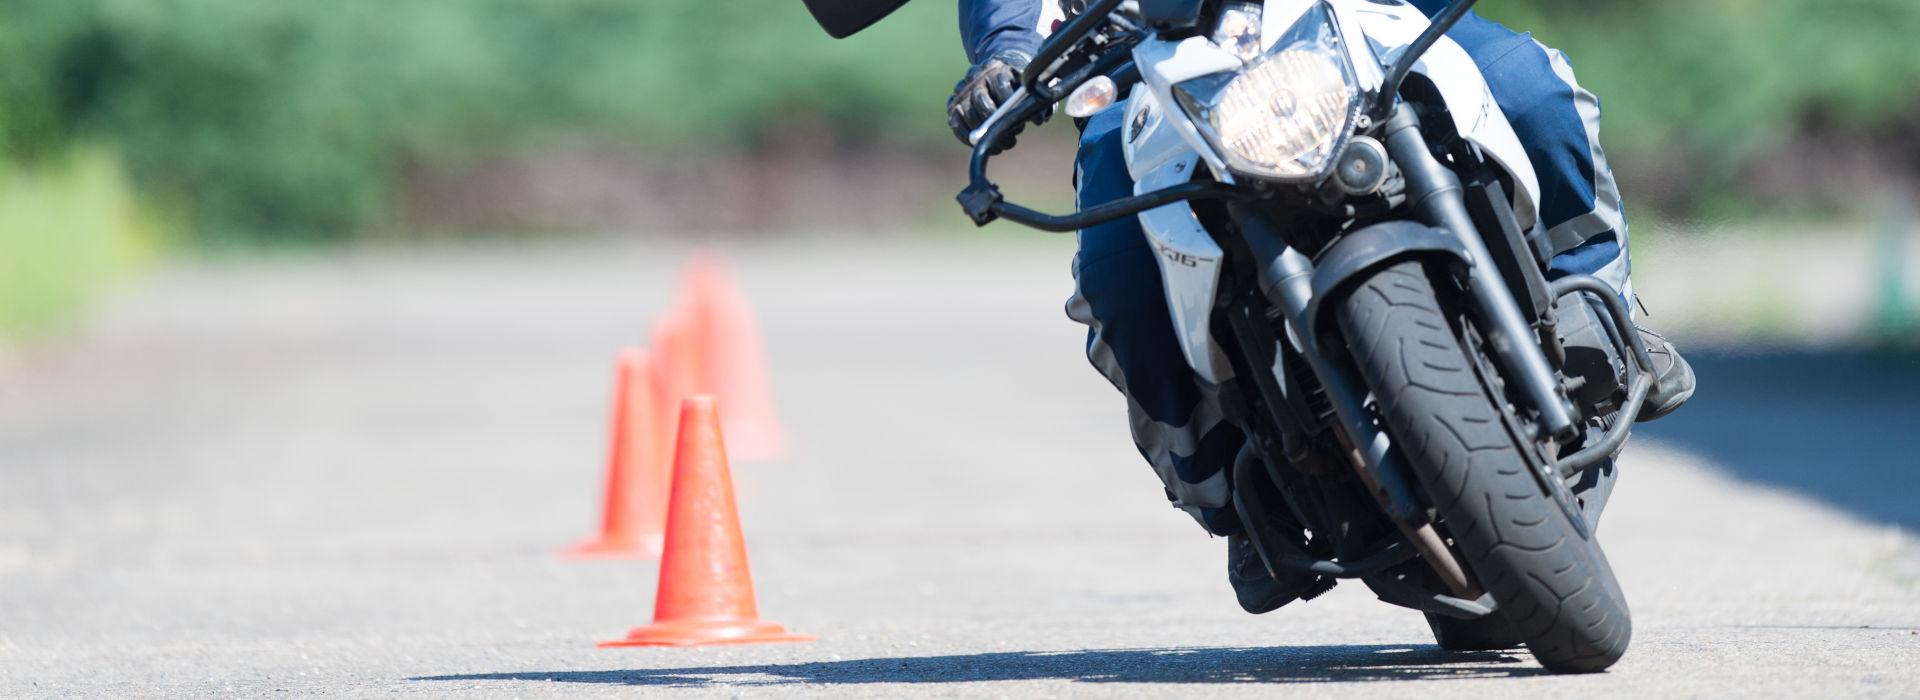 Motorrijbewijspoint Ridderkerk motor rijvaardigheid